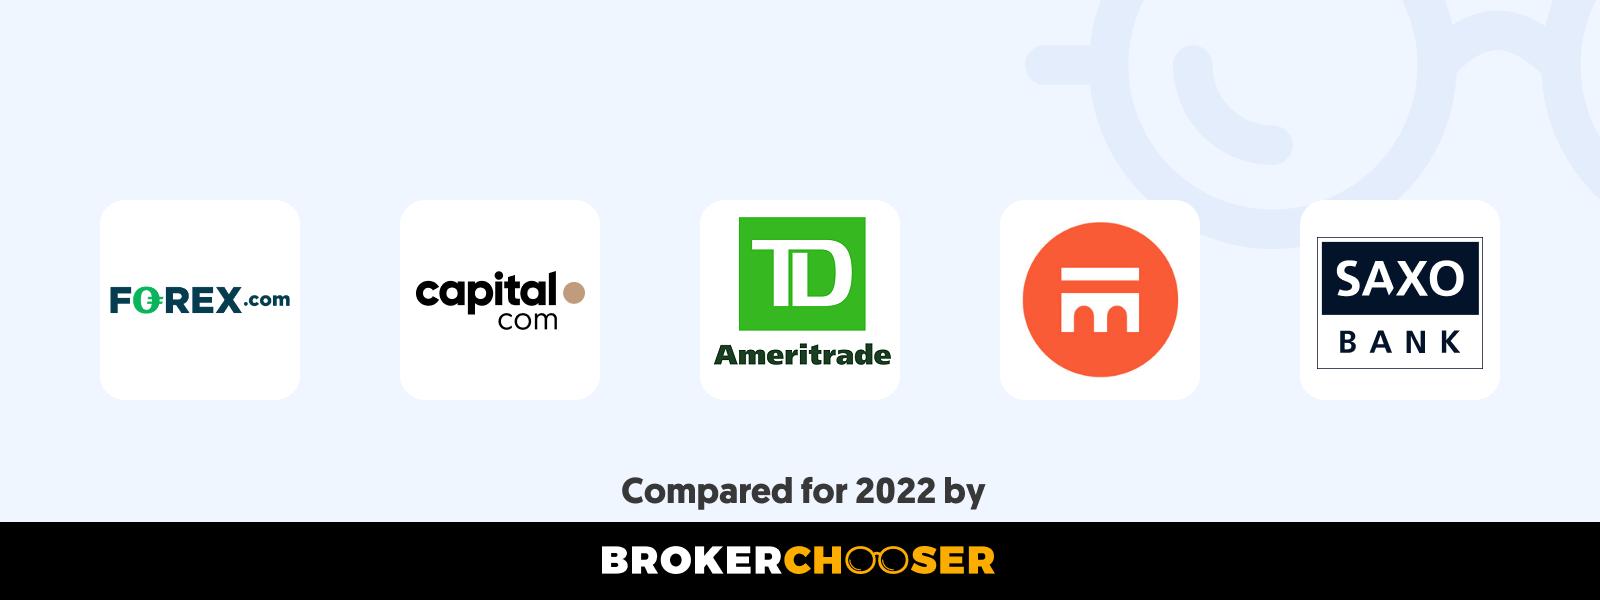 Best forex brokers for beginners in Brazil in 2021